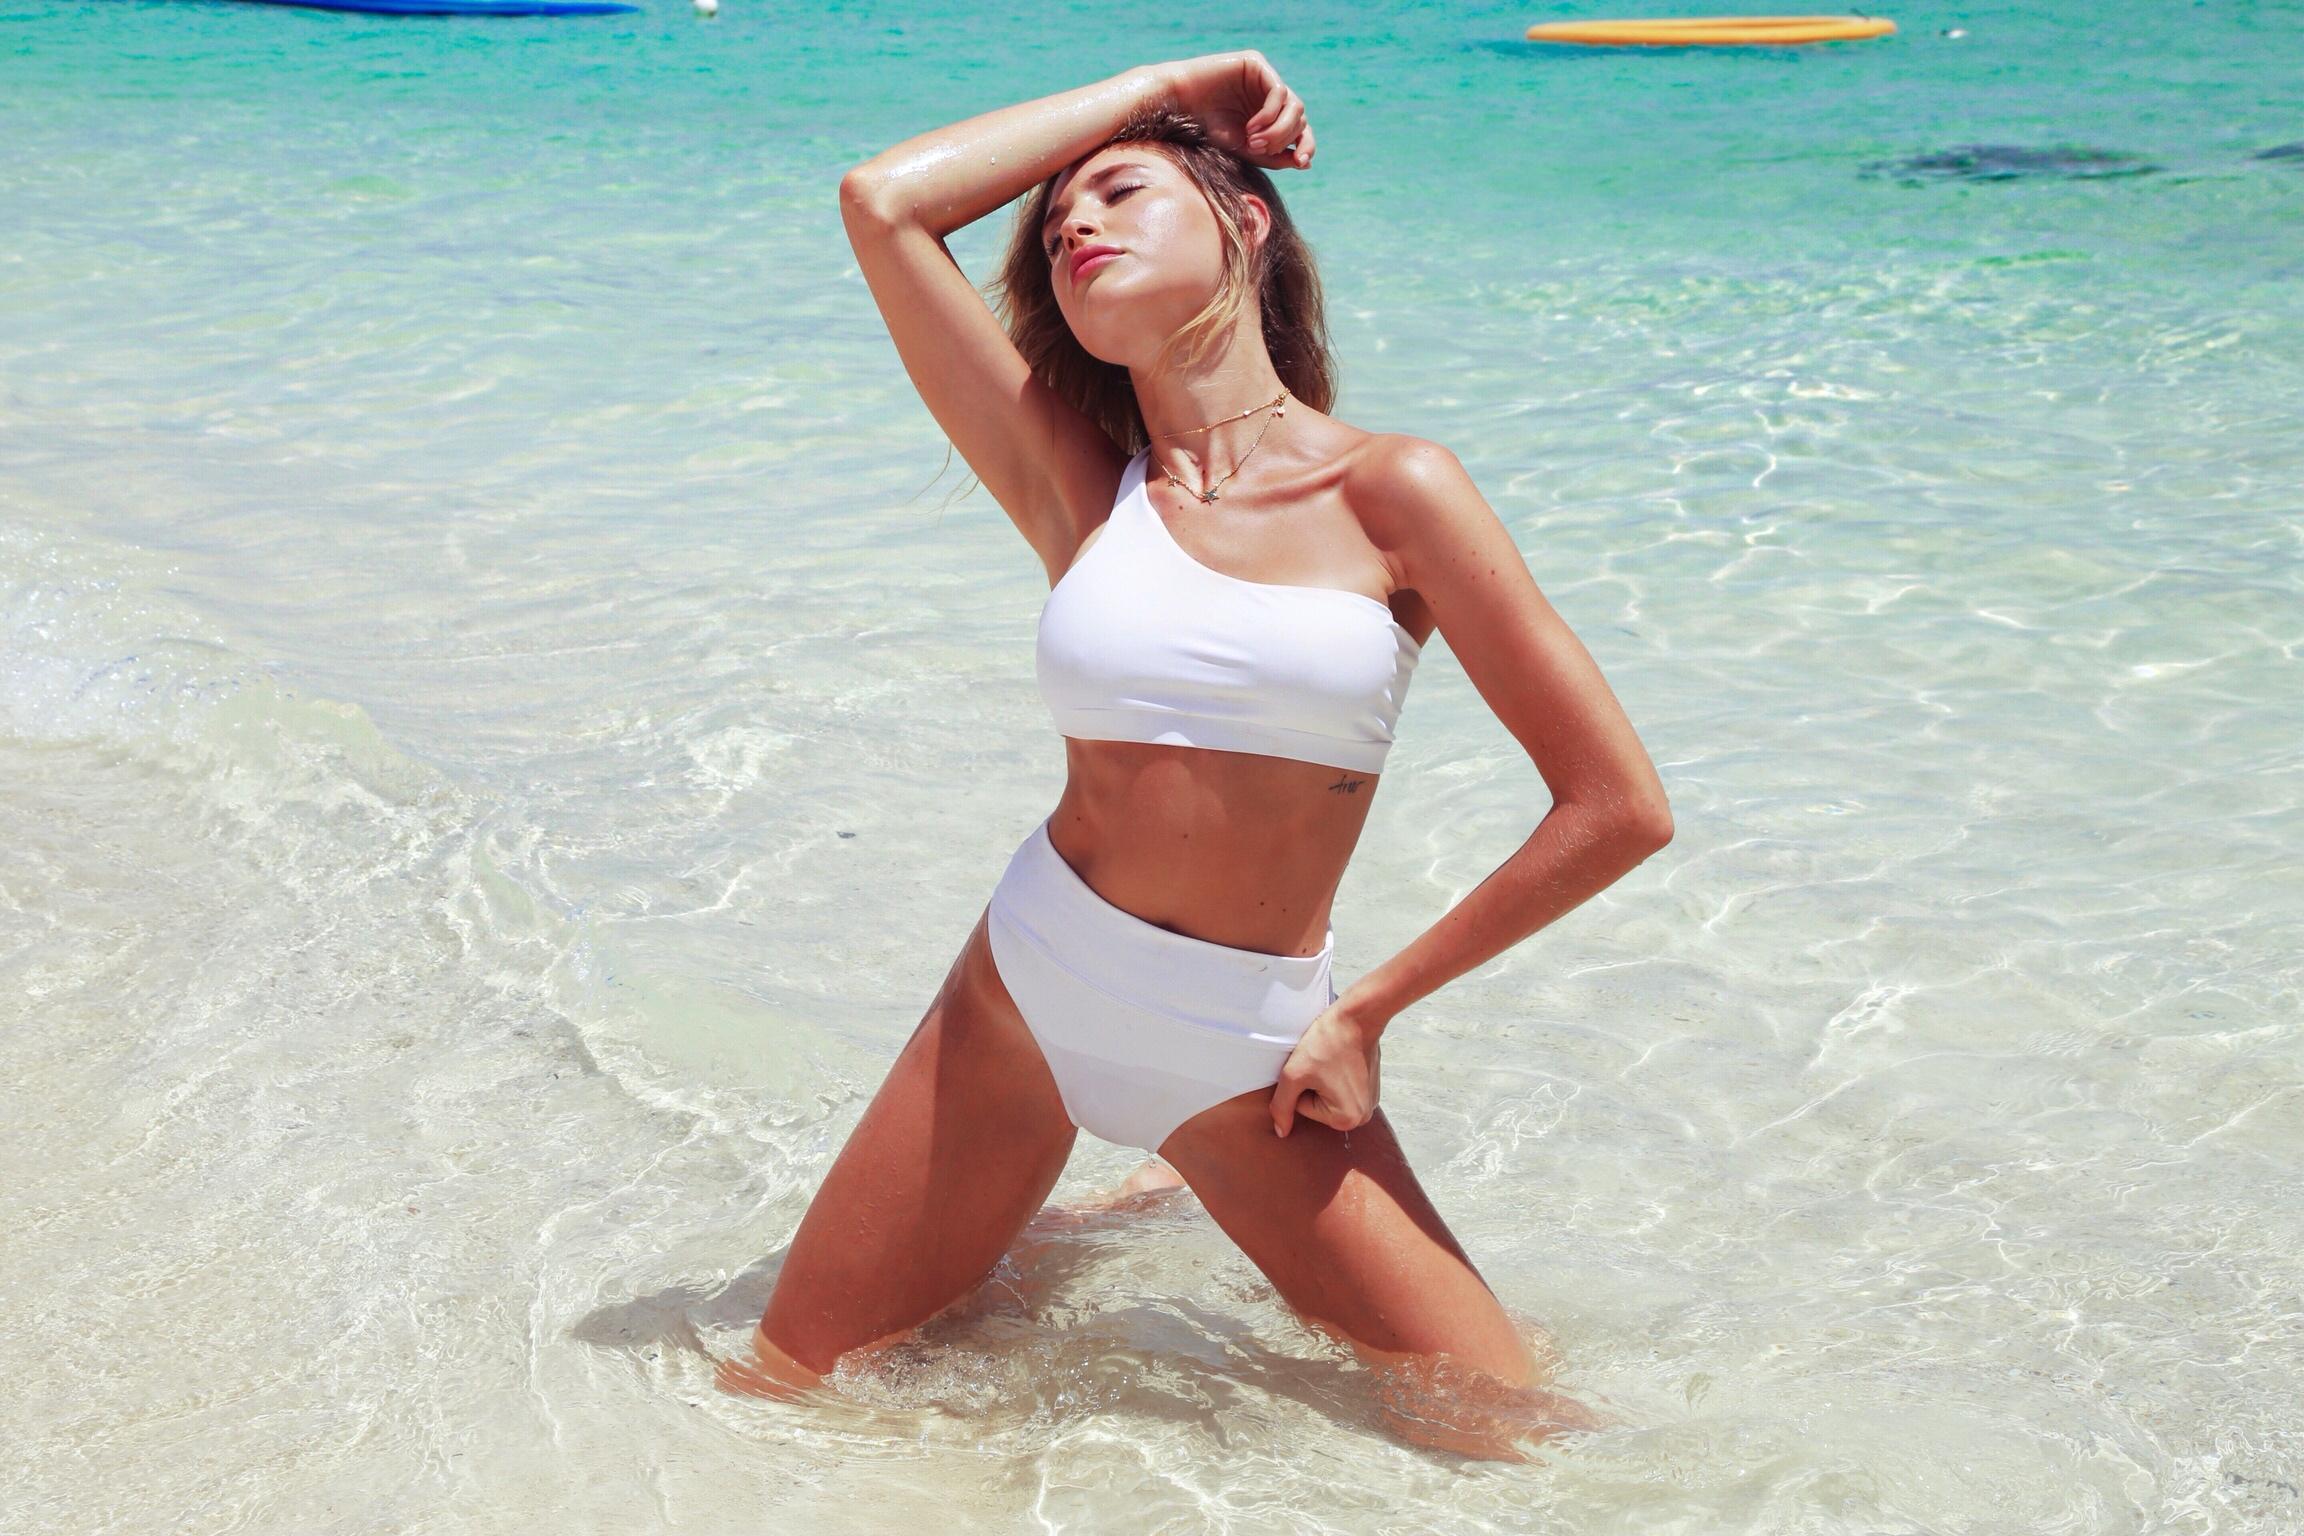 Bahamas Getaway - Newmark Models take SLS Baha Mar